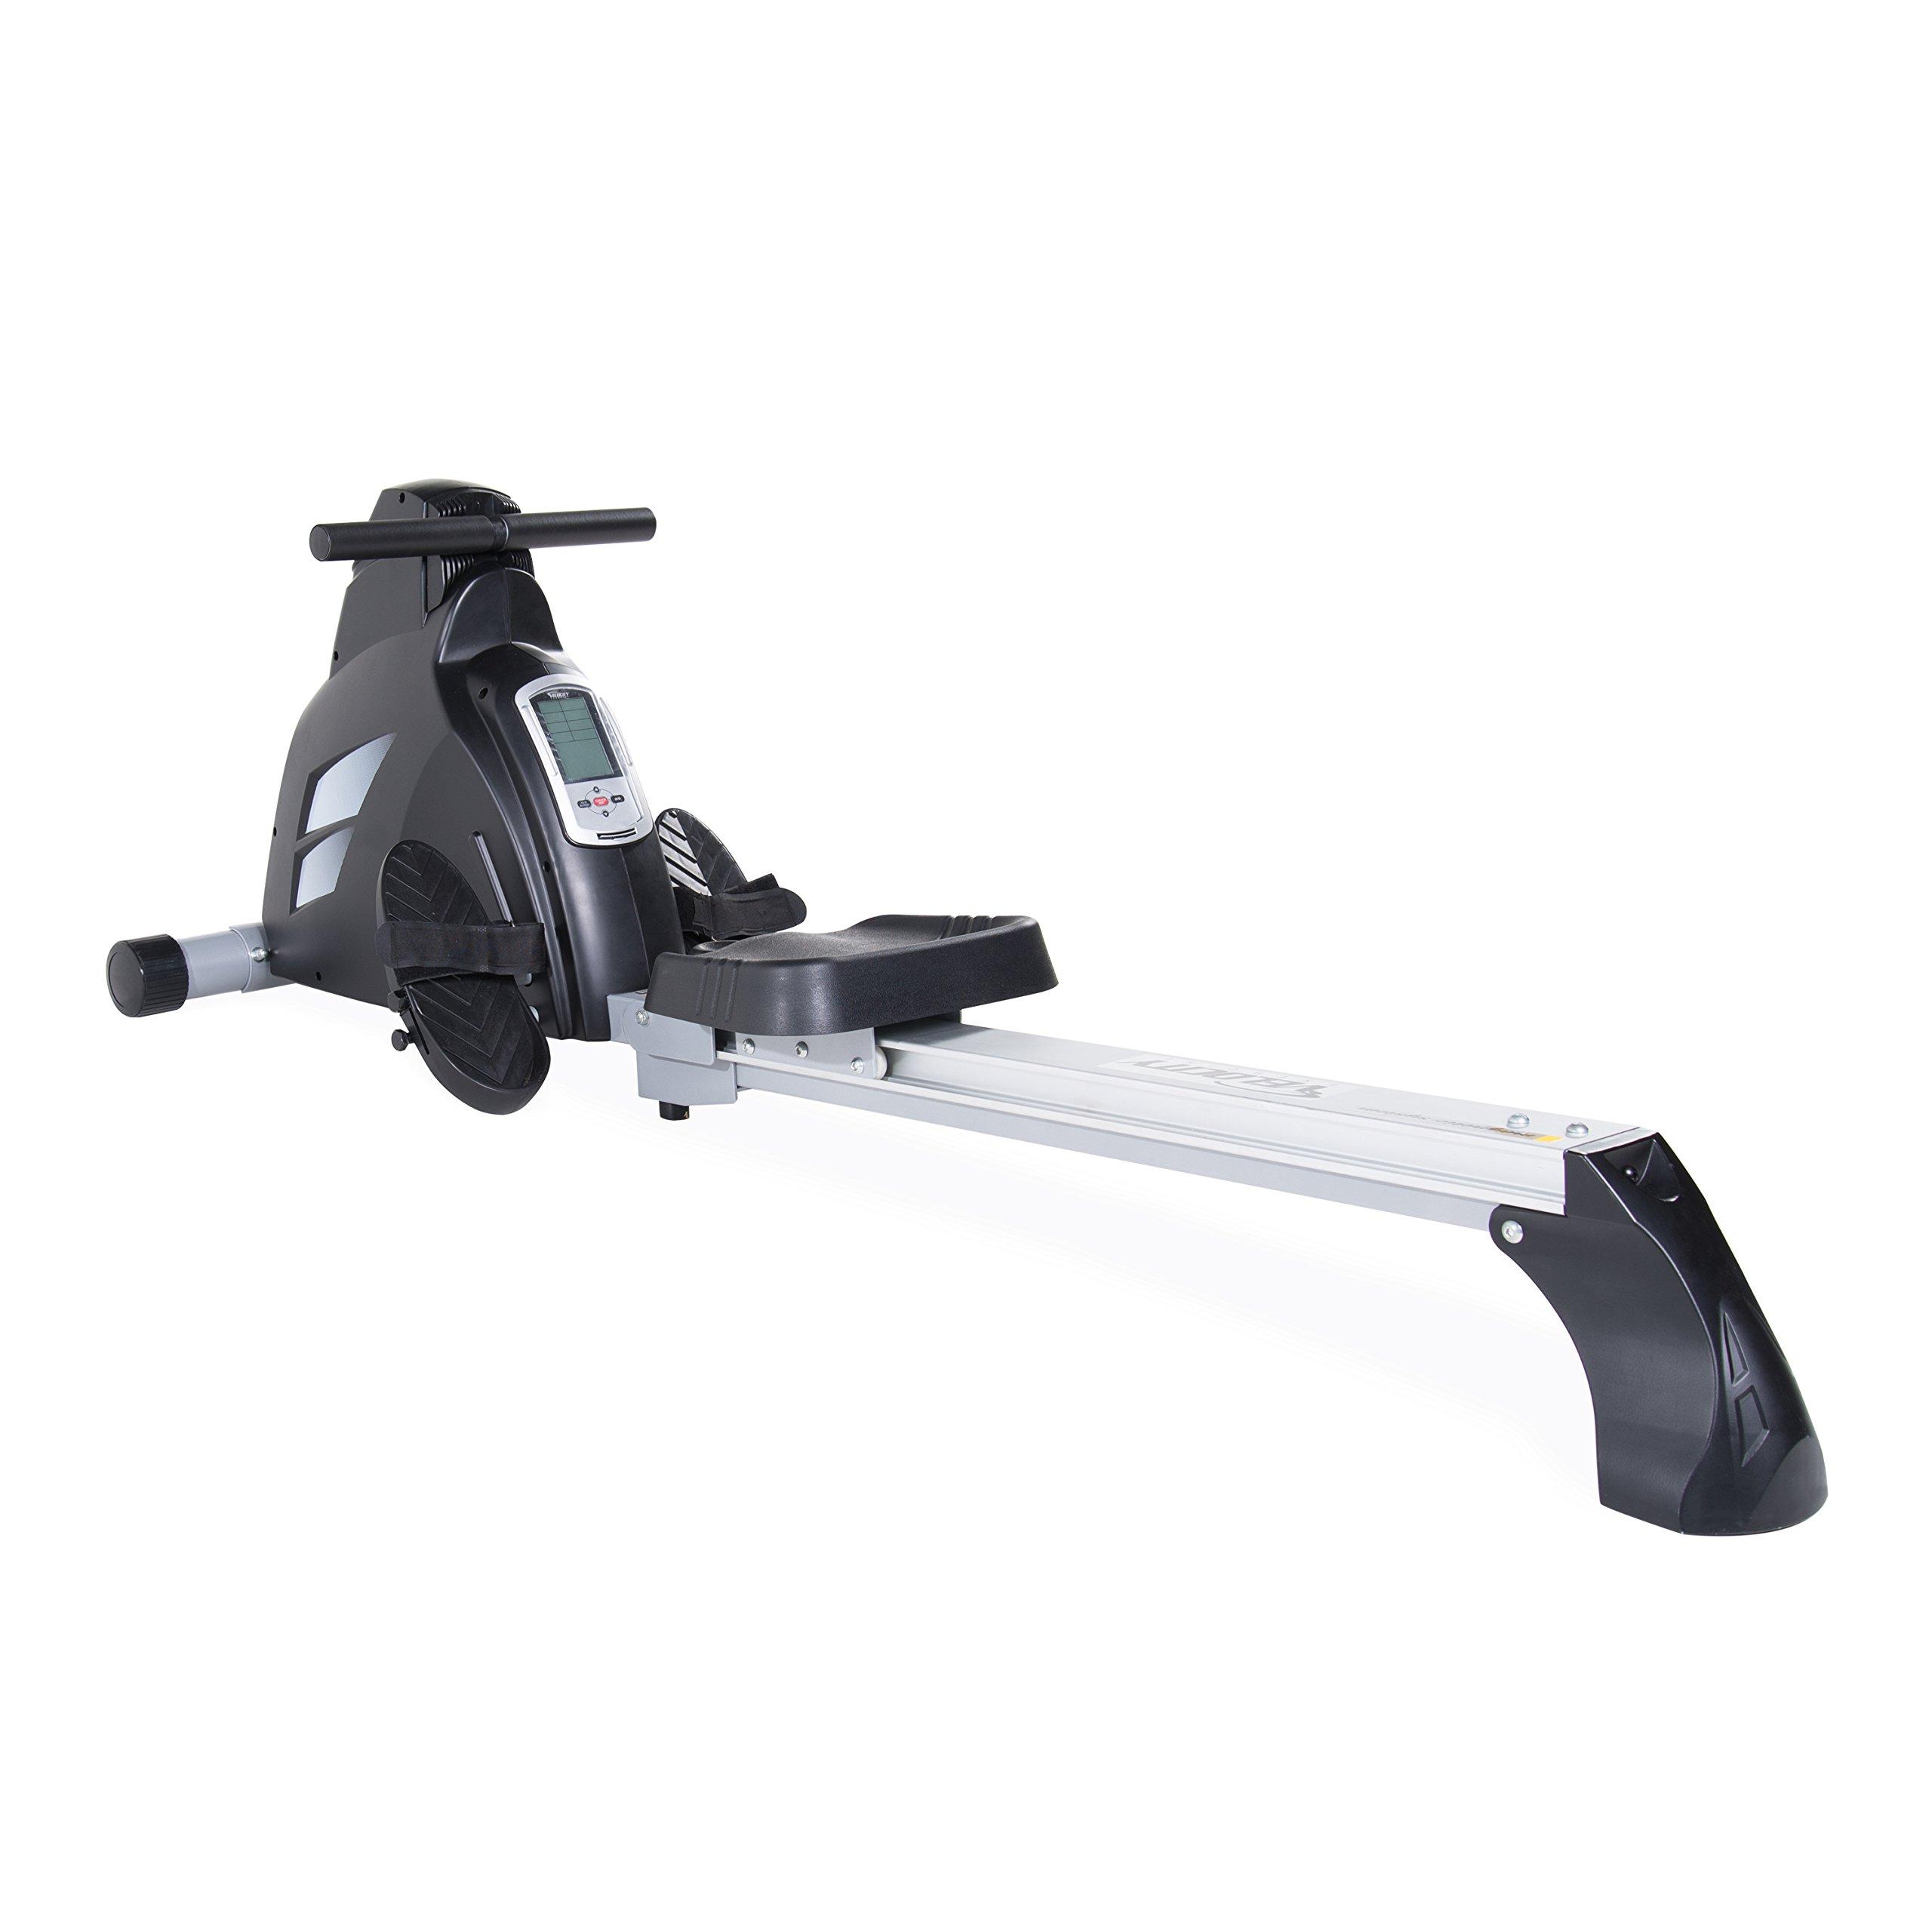 Velocity Exercise black Magnetic Rower by velocityexercise